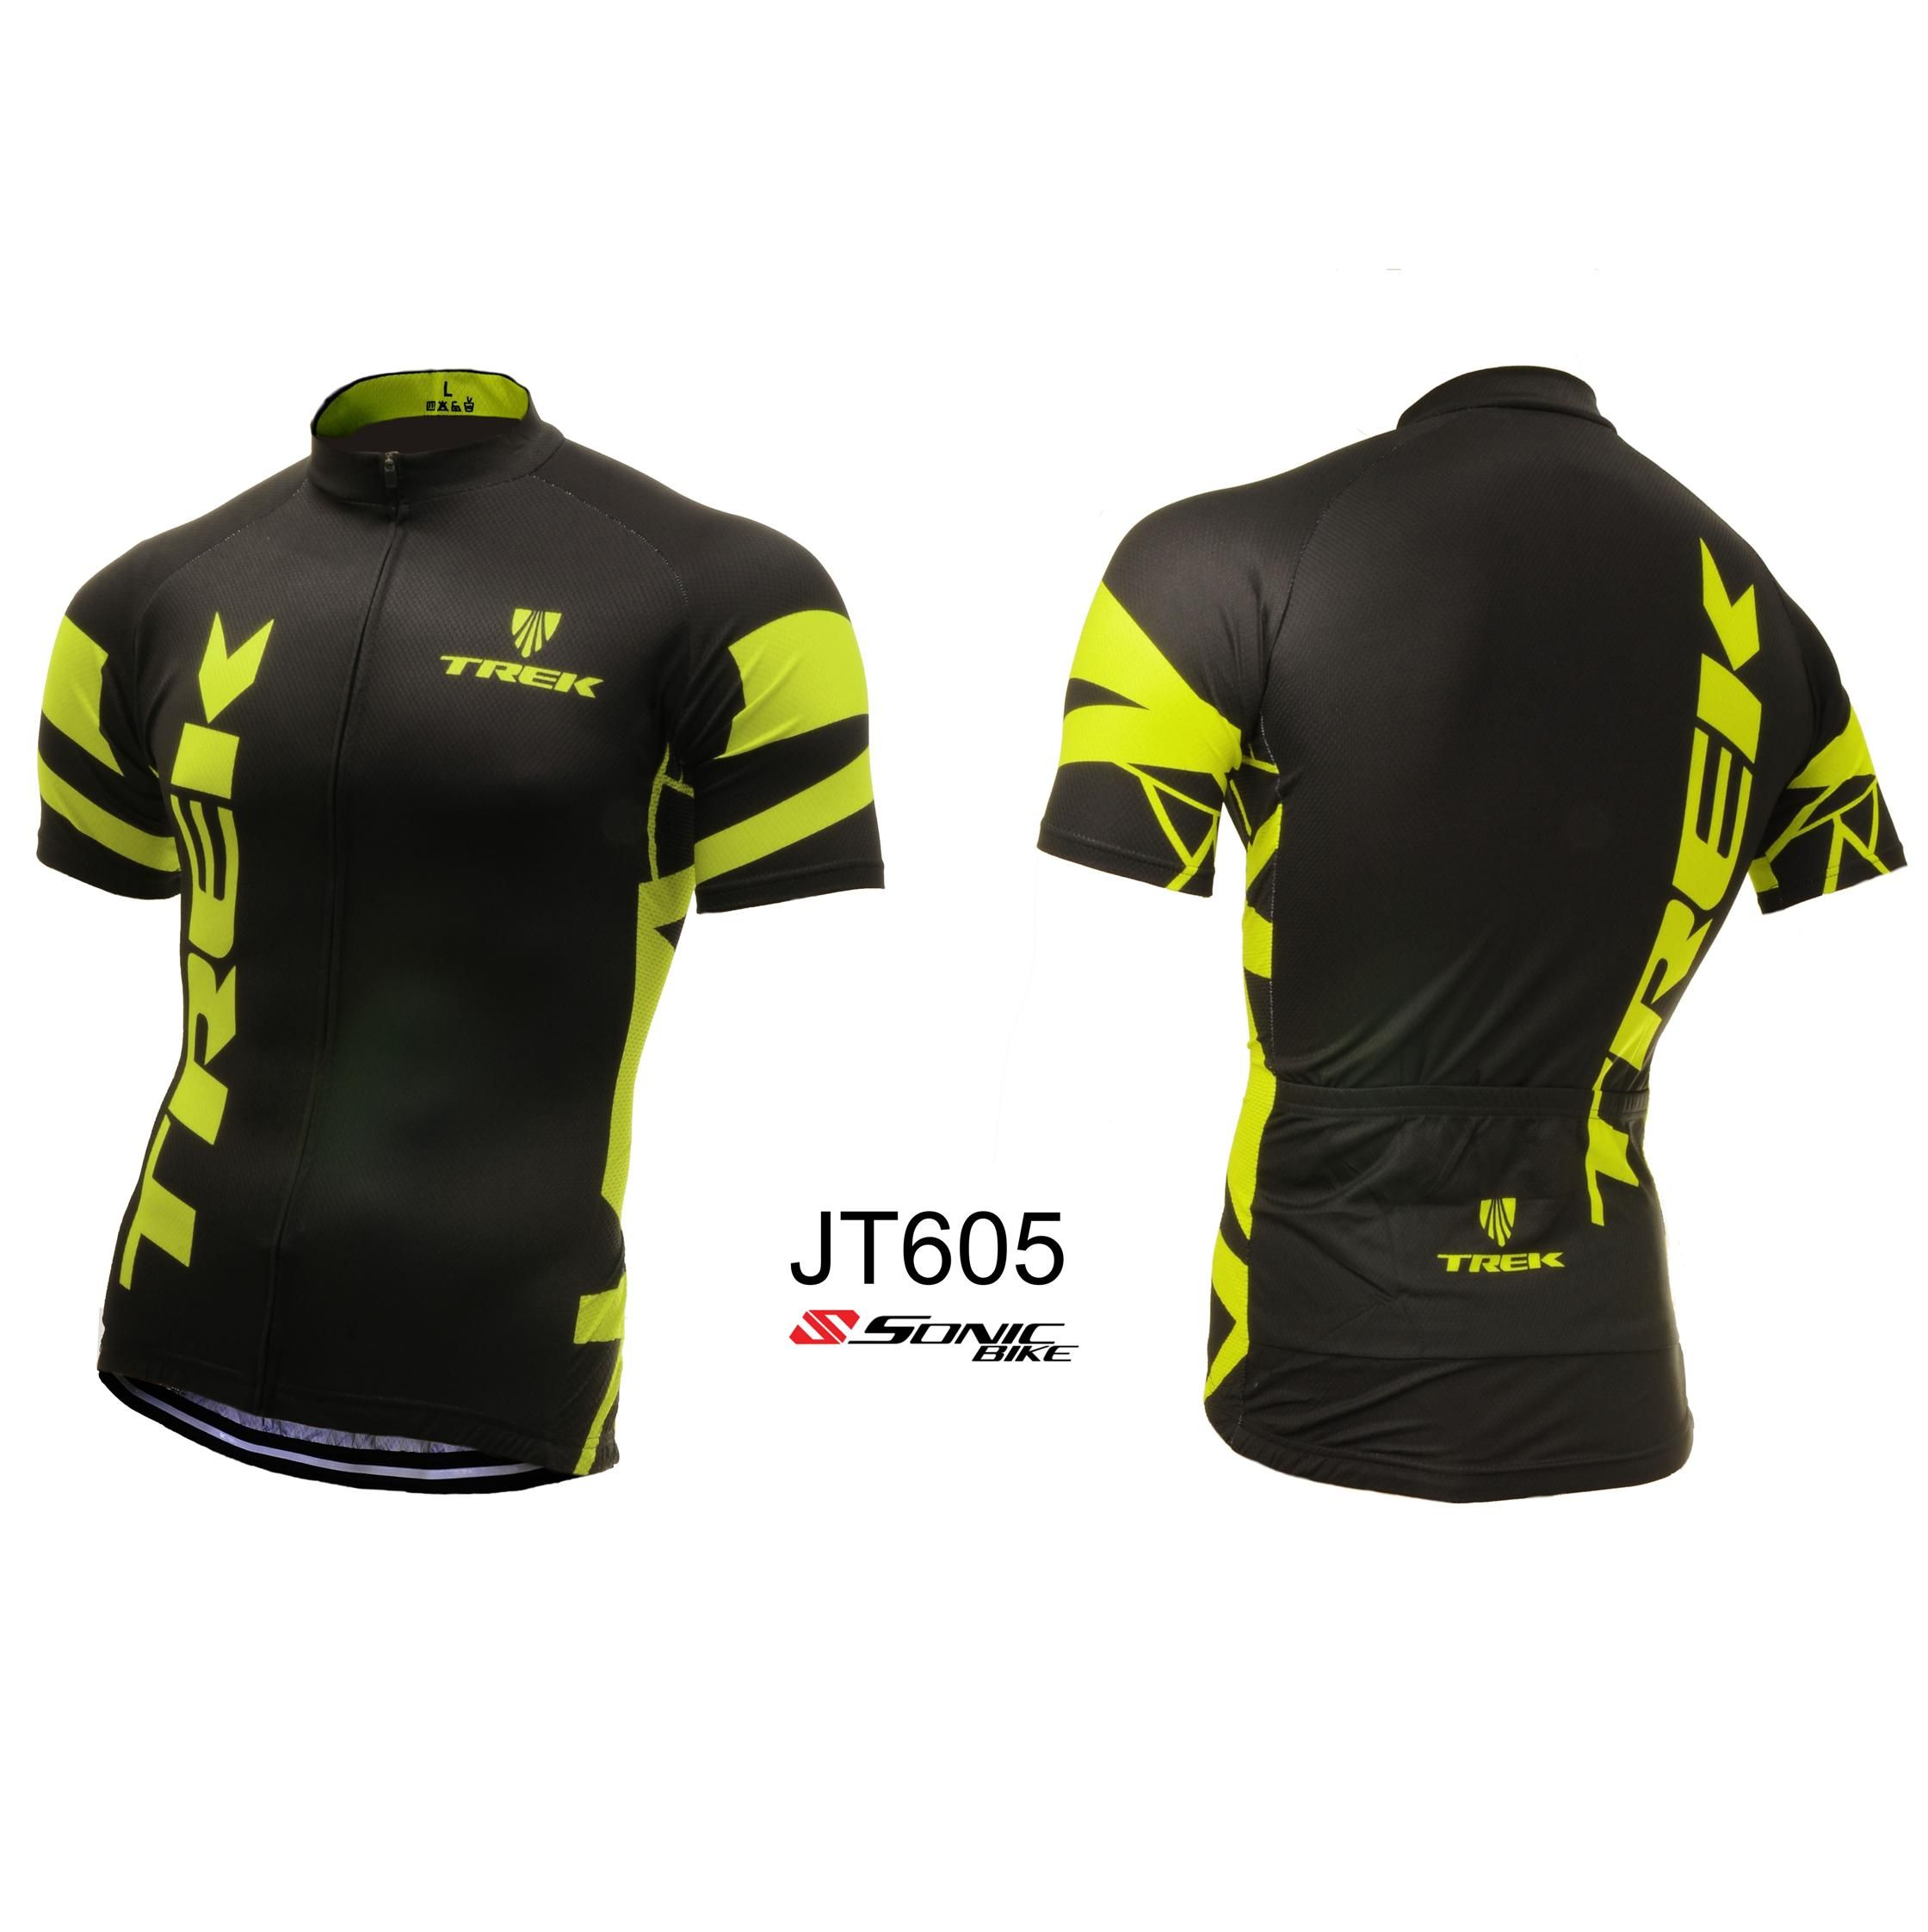 4ab034a1dbb 2016 TREK Cycling Jersey   Cycling Wear - JT605